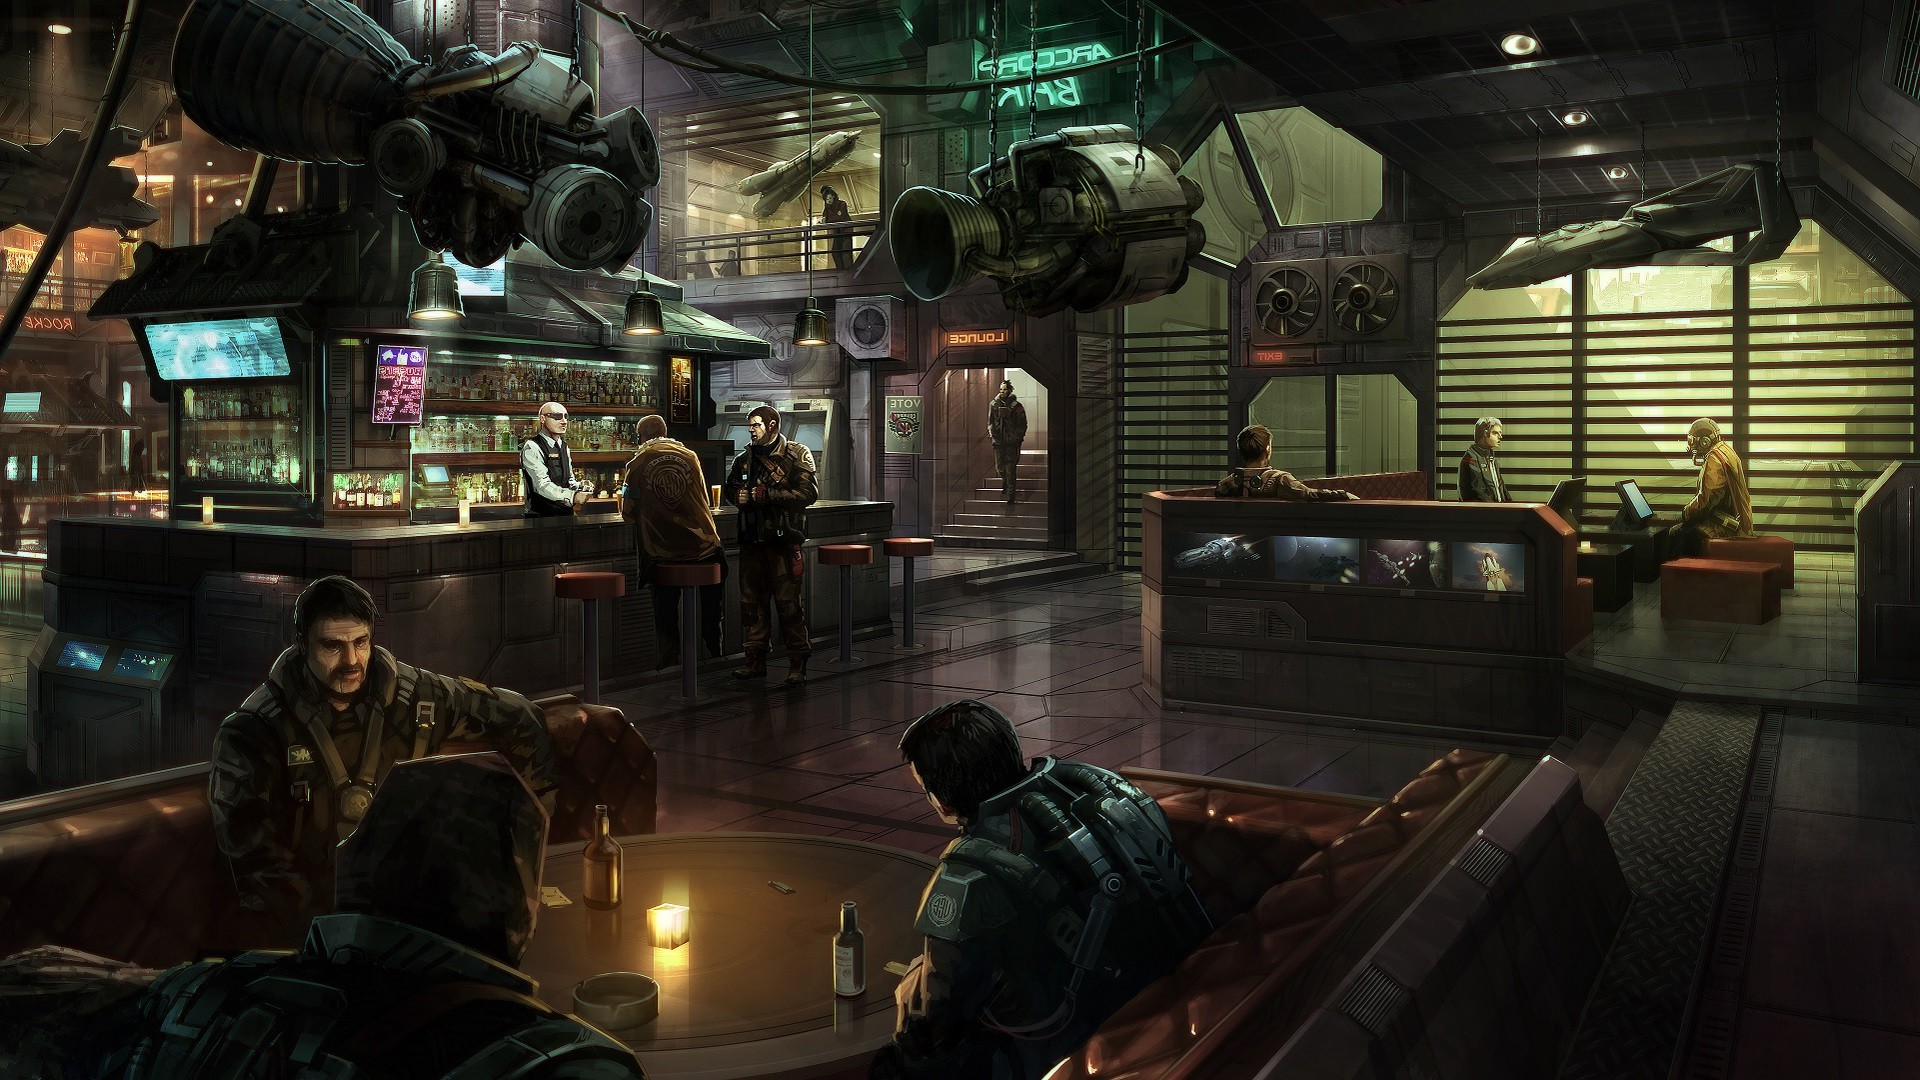 Space Spaceship Star Citizen Bar Digital Art ArcCorp